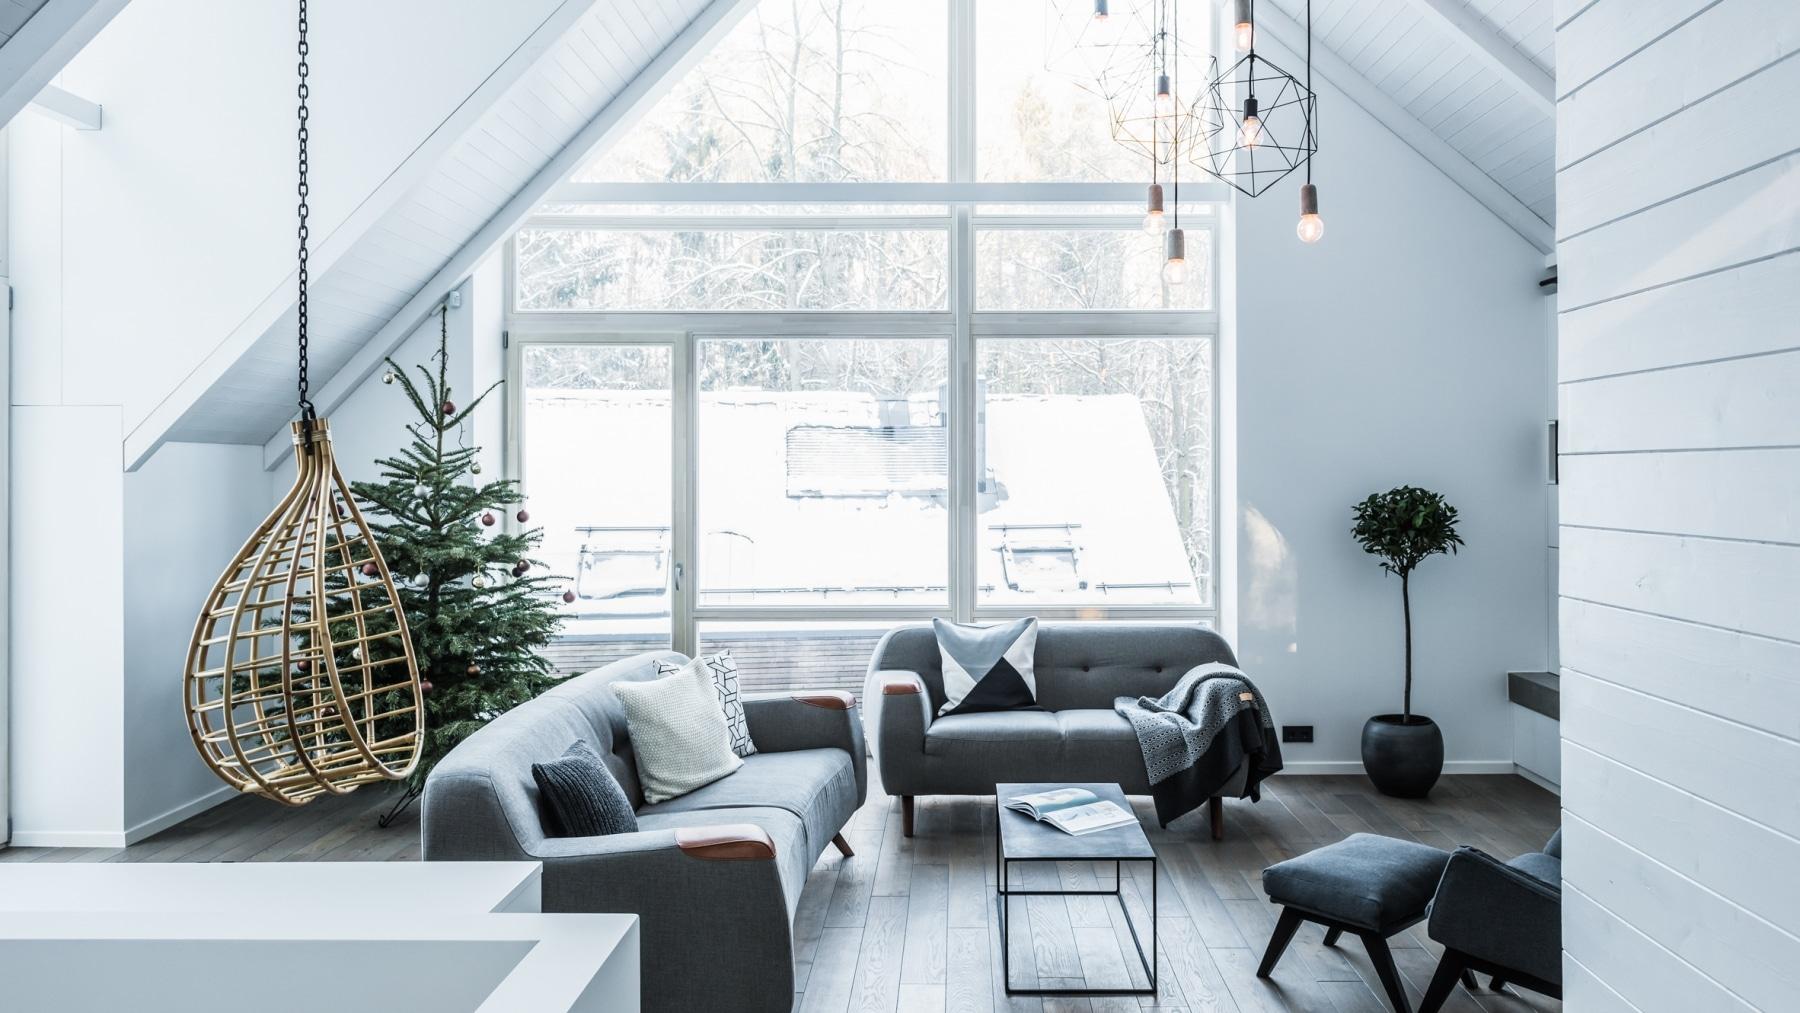 dezeen monochrome design interior